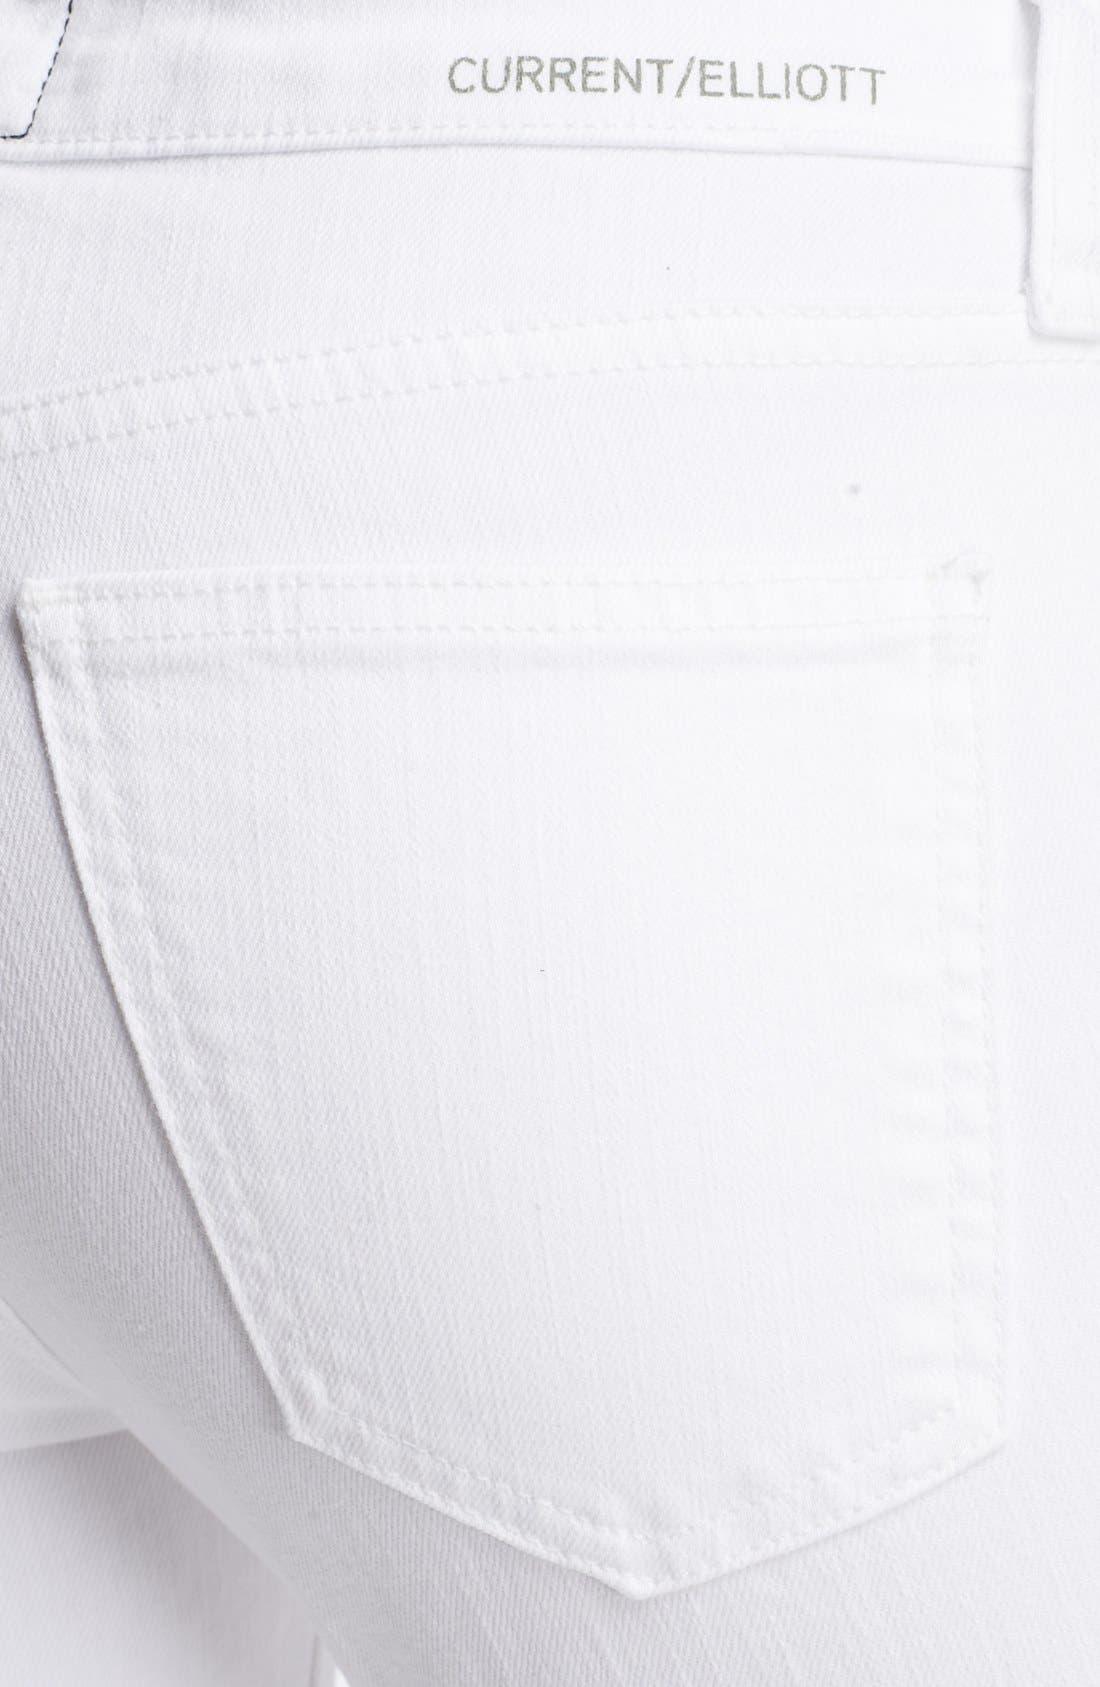 Alternate Image 3  - Current/Elliott 'The Stiletto' Jeans (Sugar)